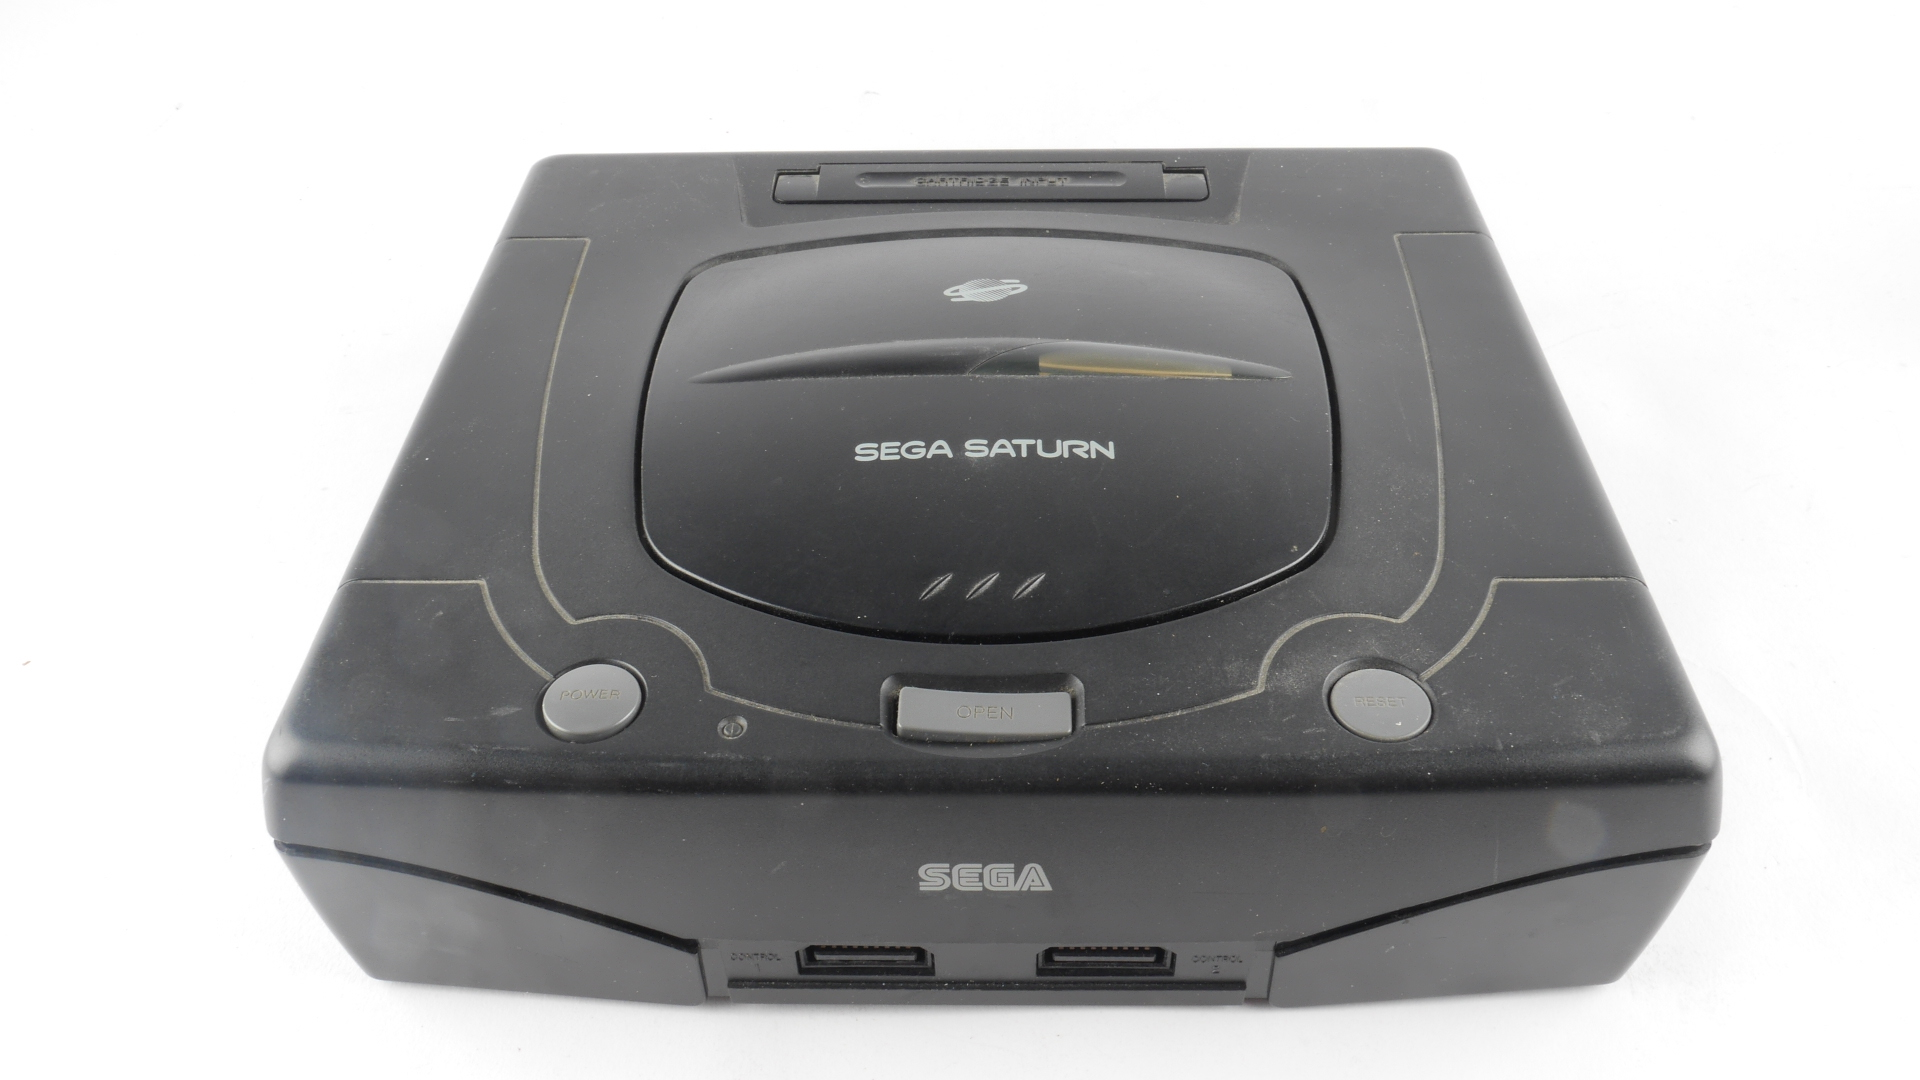 Console/SegaSaturn/SegaSaturn.jpg